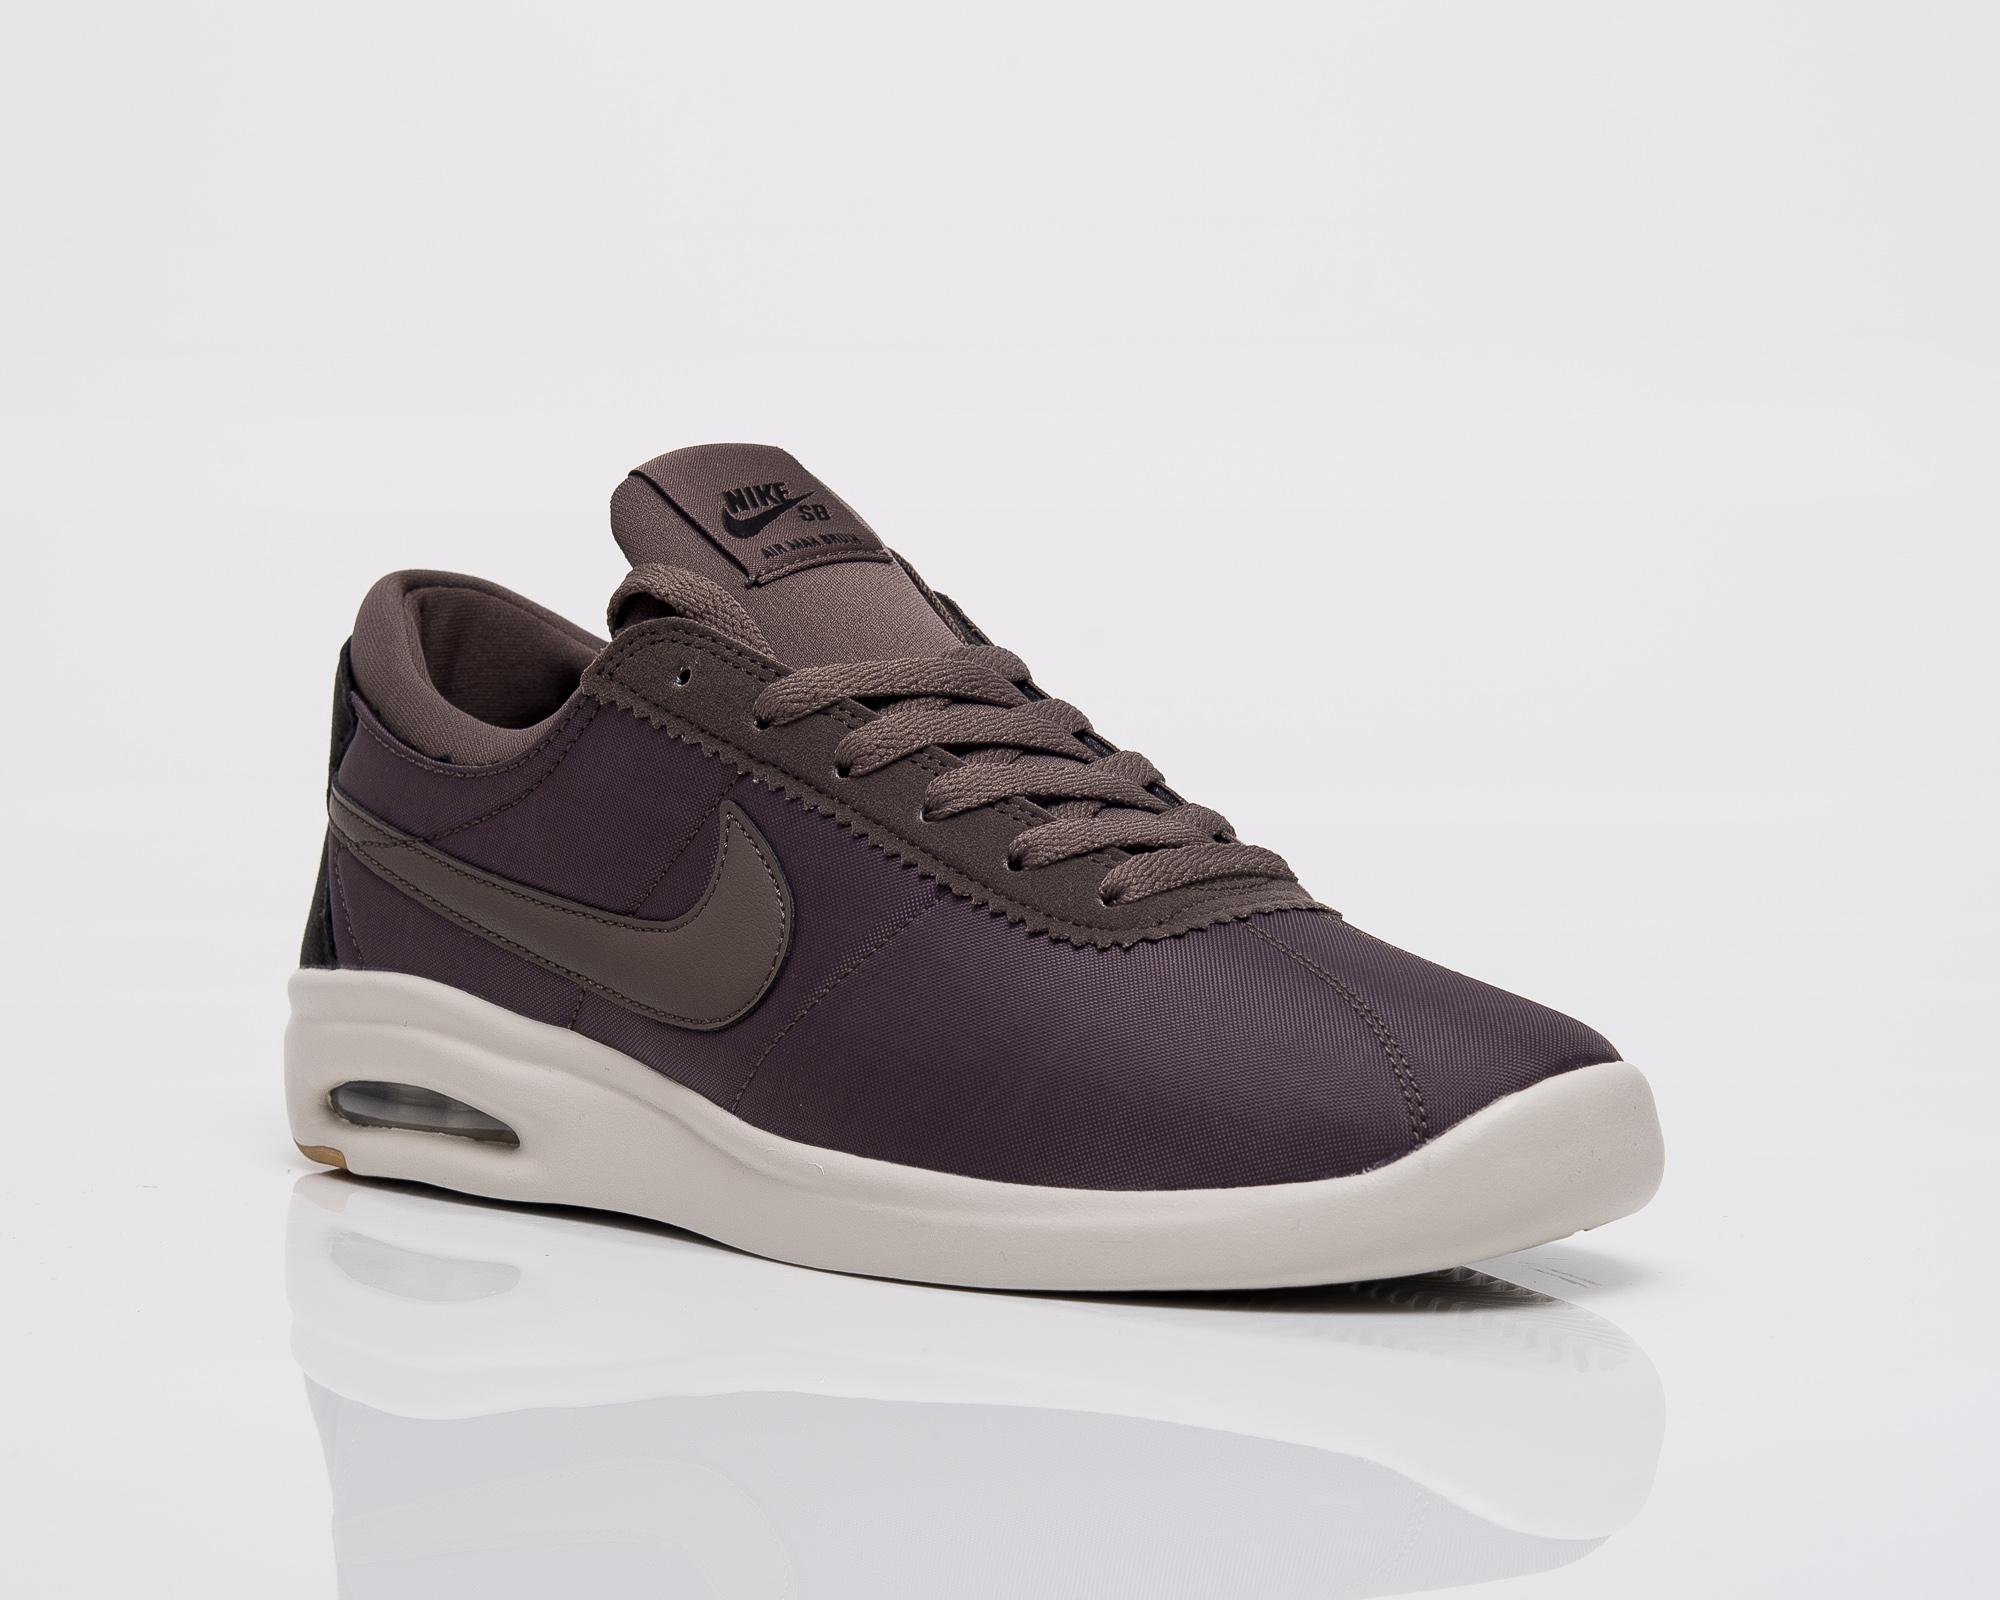 5c02fbb177a Nike SB Air Max Bruin Vapor TXT - Shoes Casual - Sporting goods